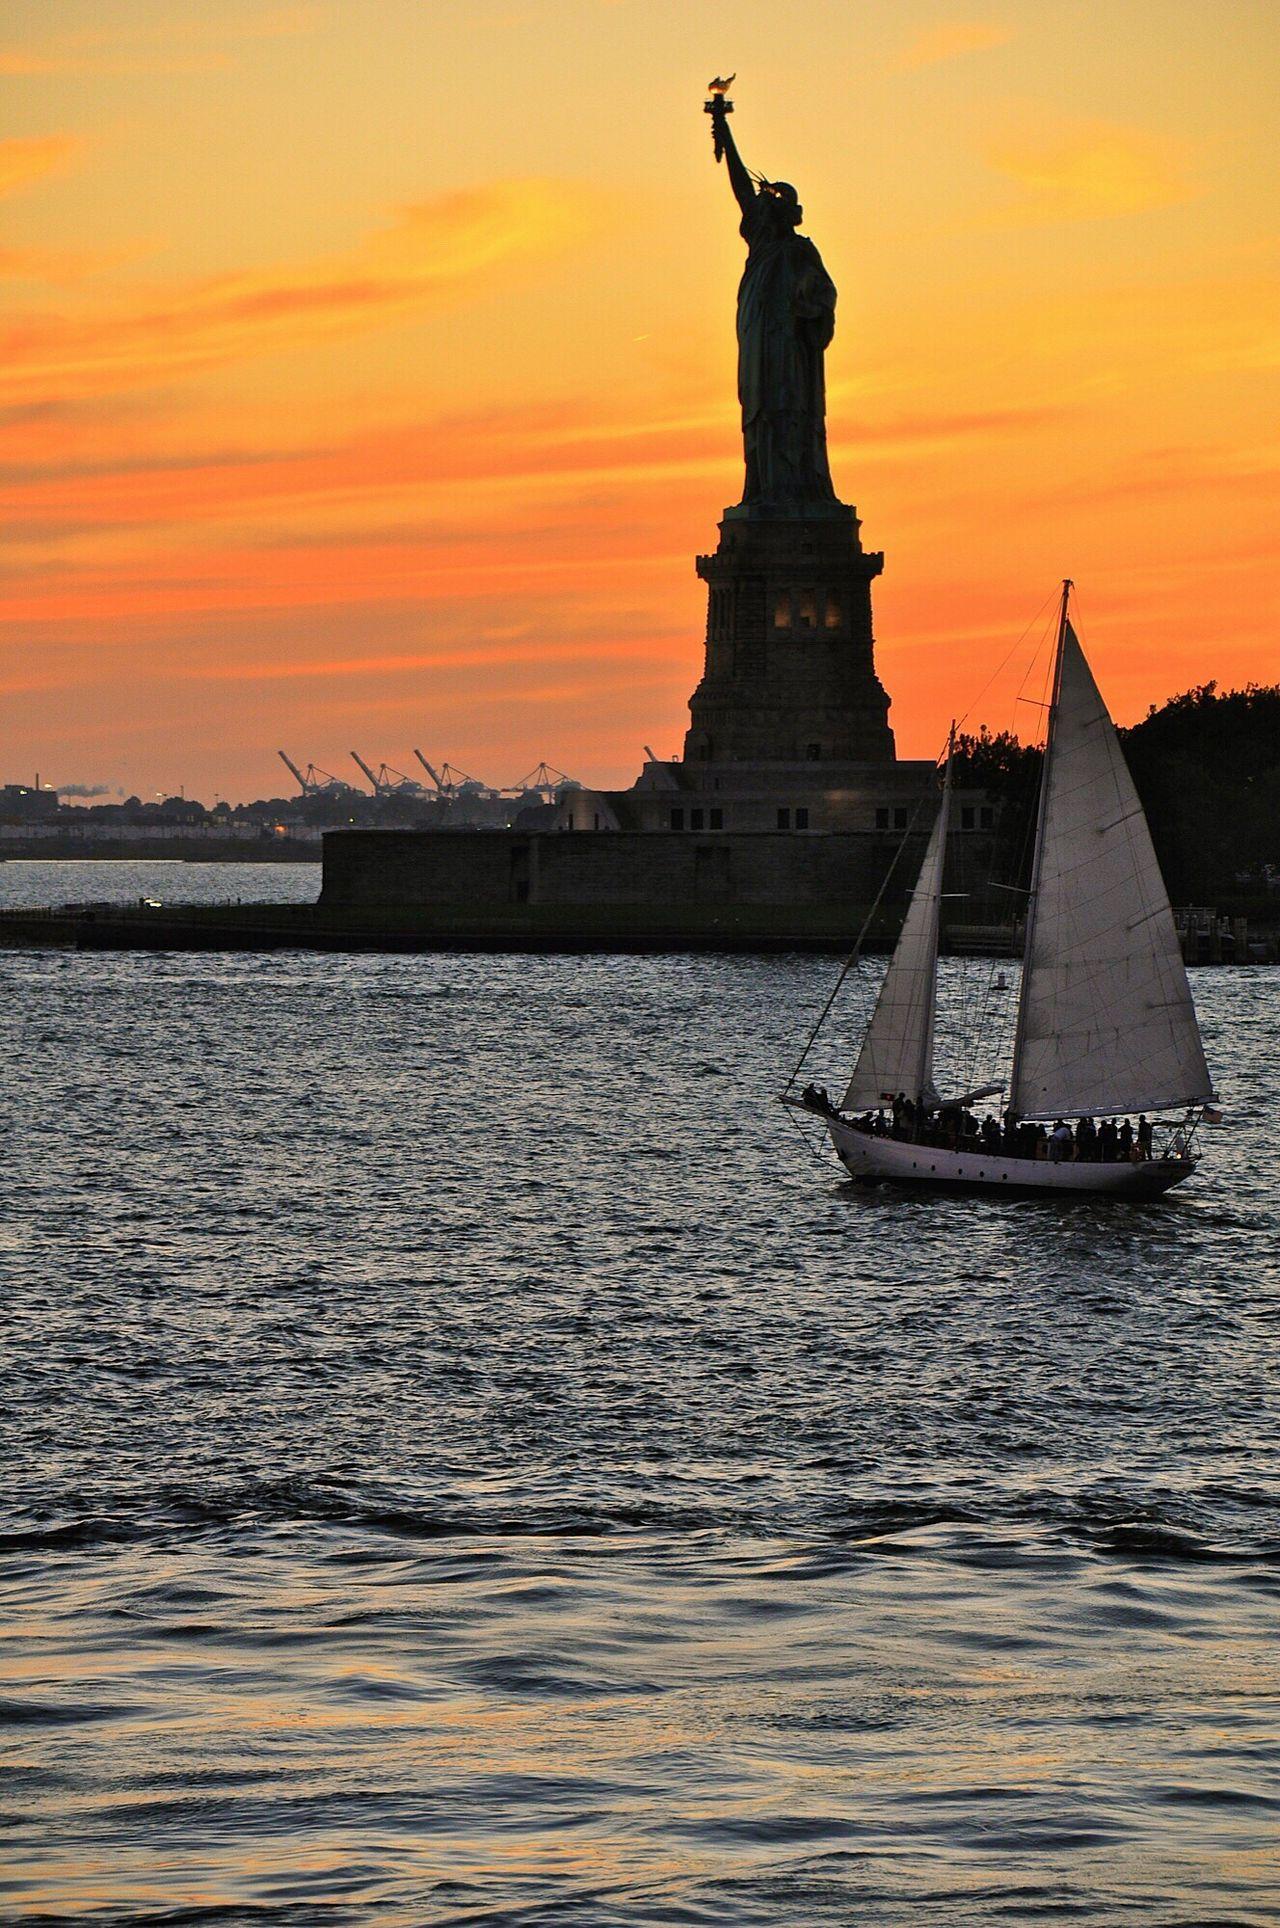 ✨Statue of Liberty✨ New York New York City Sailing Hudson River Impression Enjoying Life Sunrise Sunset Water Statue Statue Of Liberty USA Traveling EyeEm Best Shots Travel Photography EyeEm Gallery Beliebte Fotos EyeEmBestPics Capture The Moment Great Atmosphere Obama Manhattan